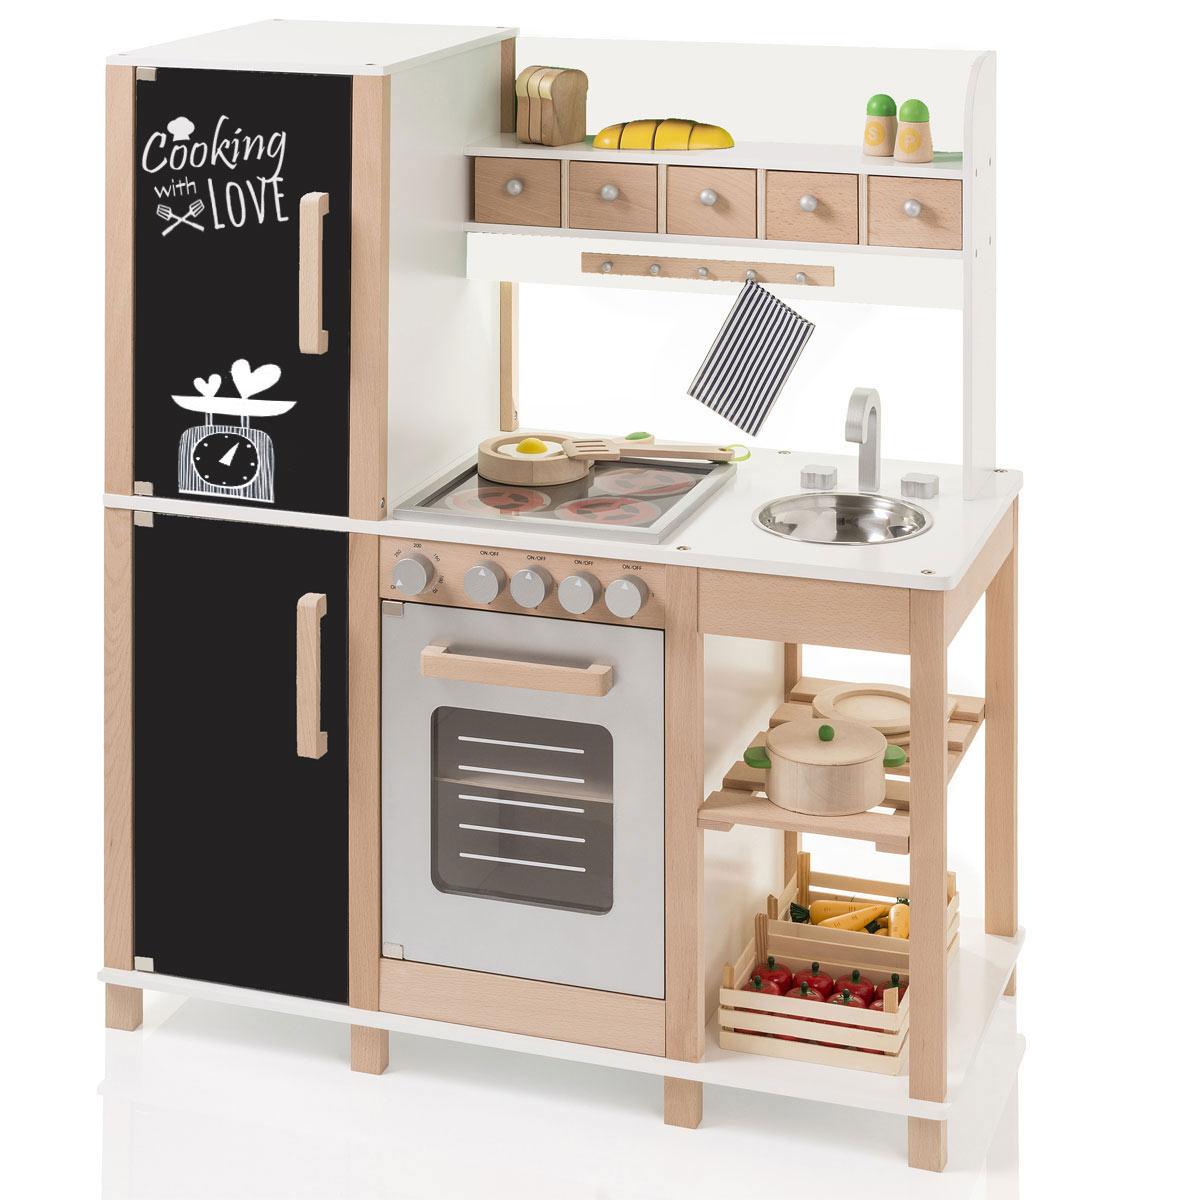 Sun kuchnia dla dzieci z tablic 4139 pirum - Cocina de nenuco ...